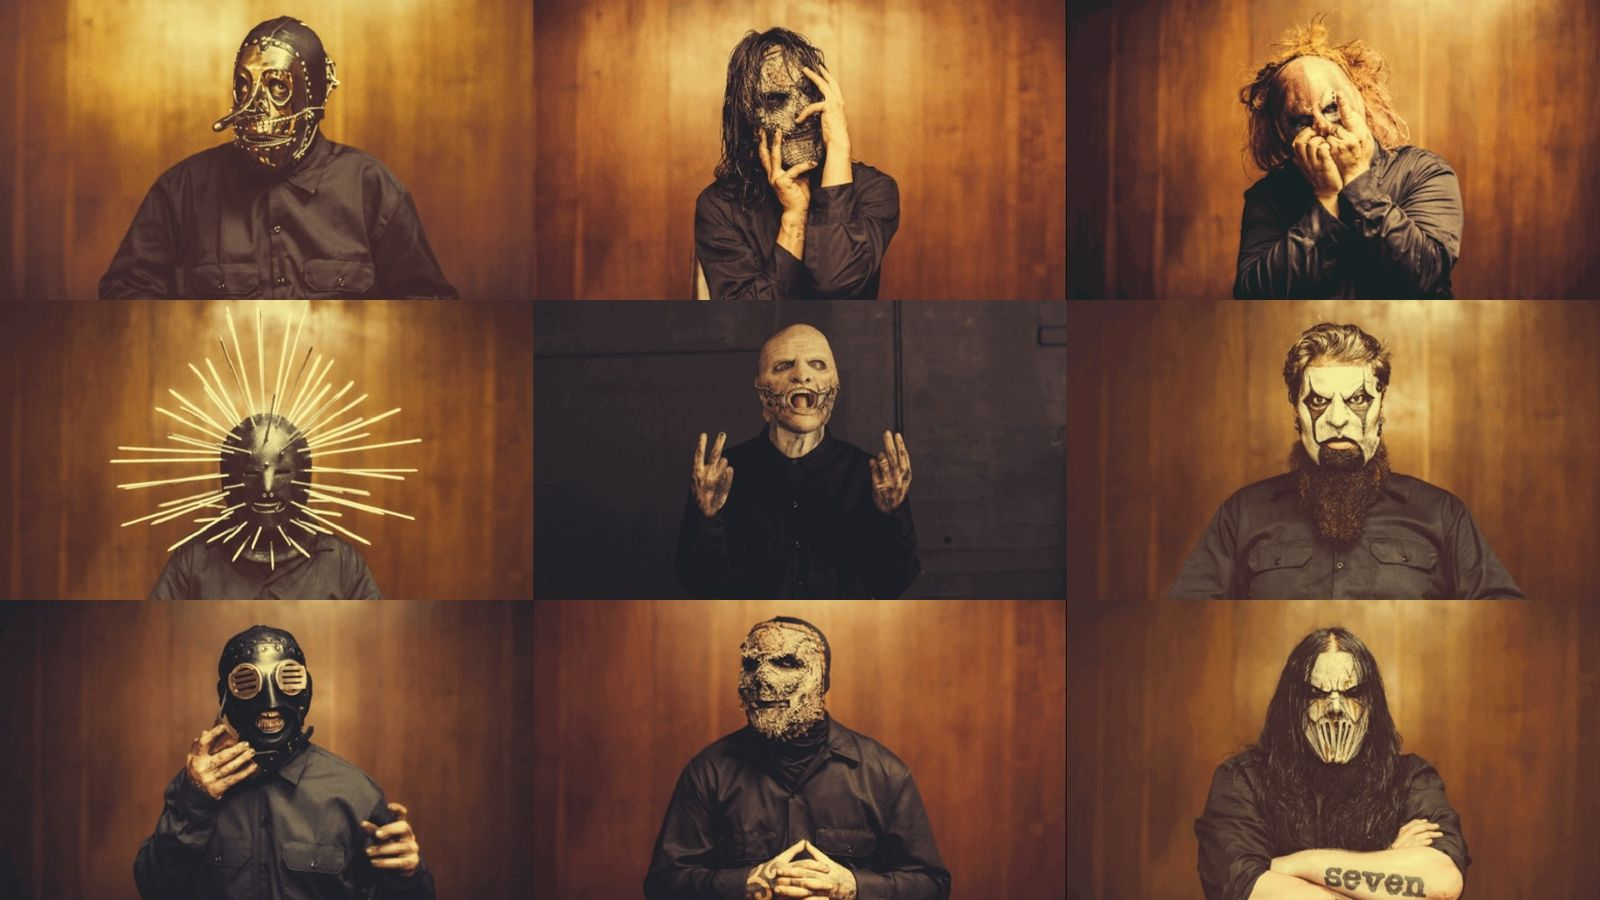 Slipknot Wallpaper Picture Image 1600x900